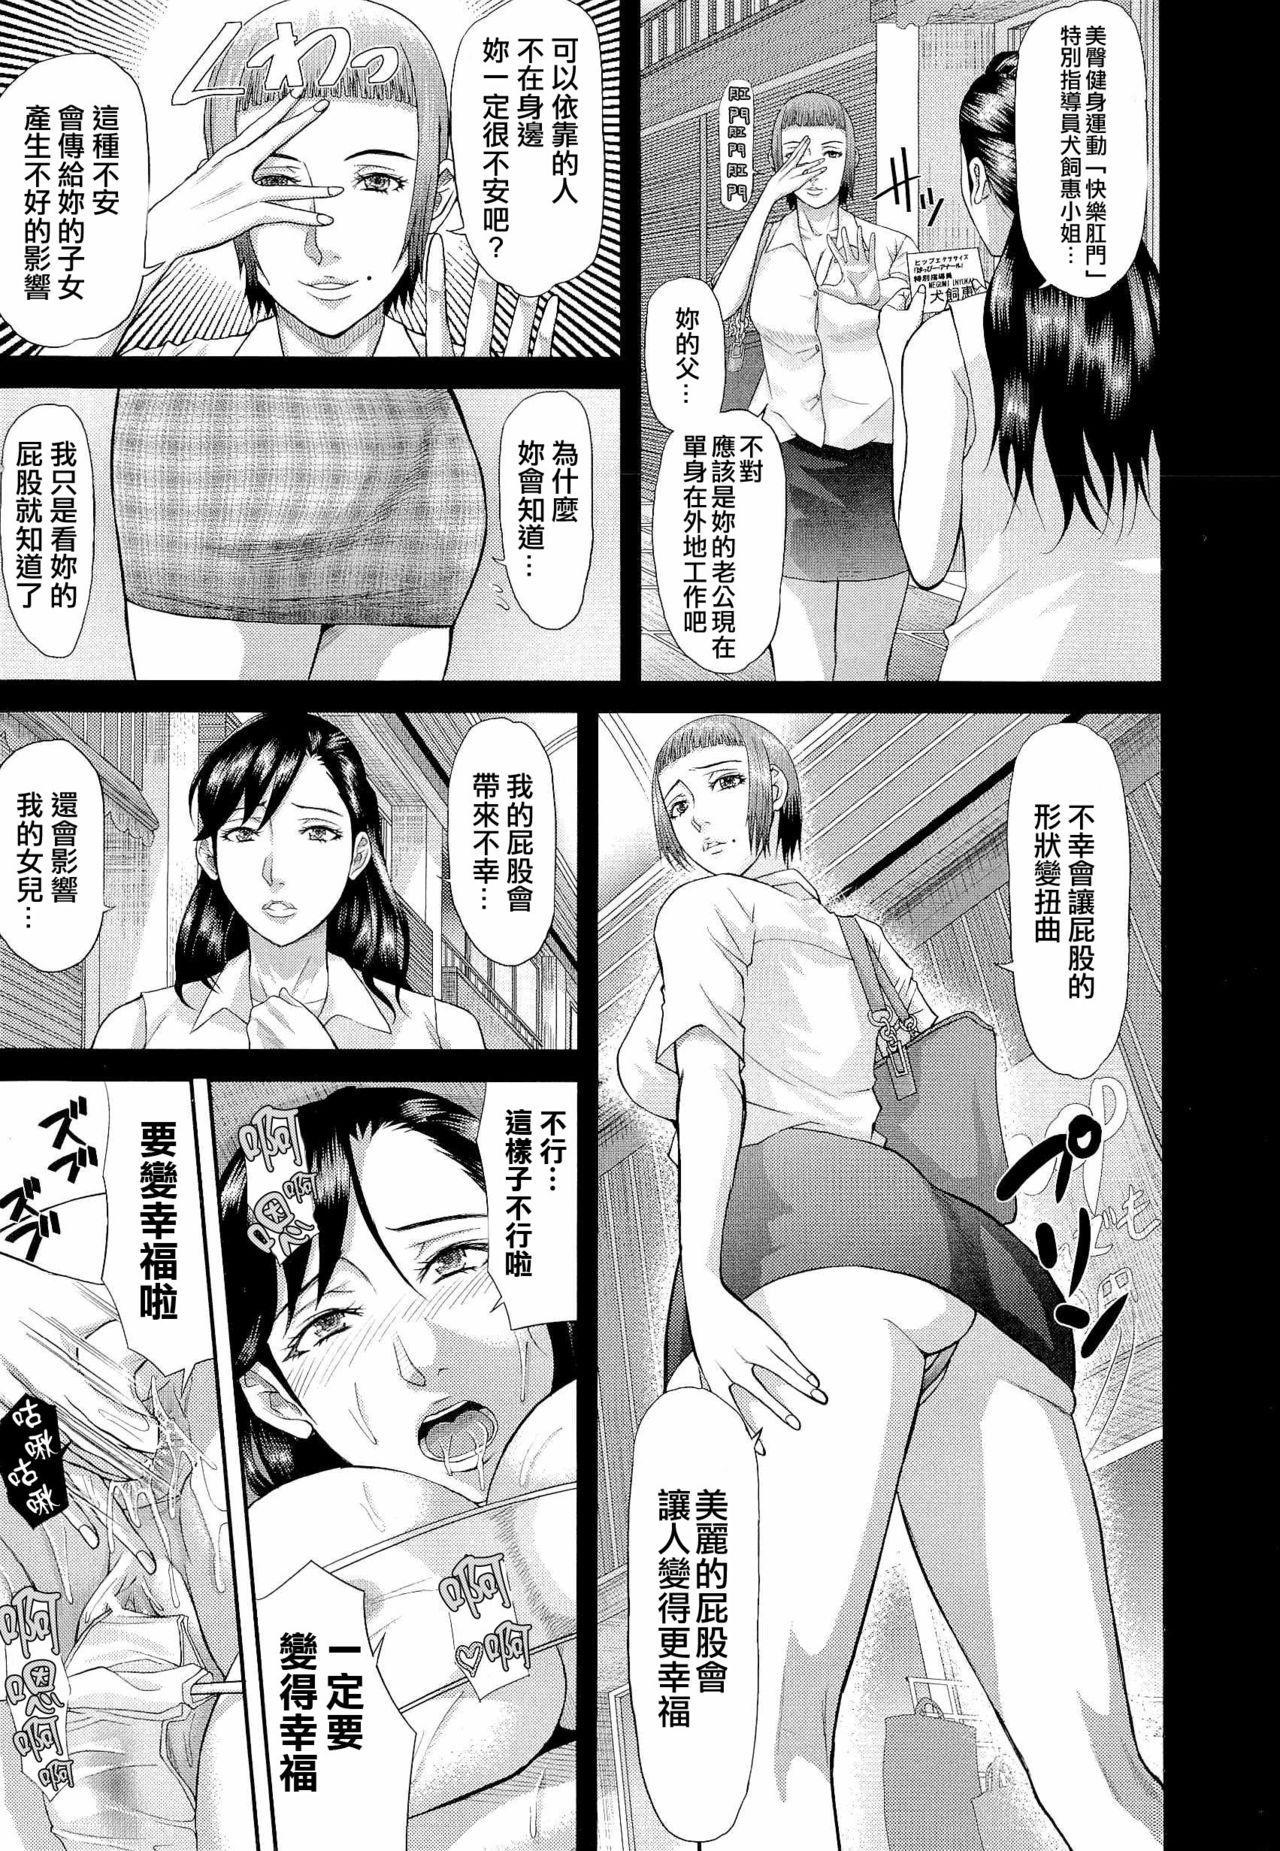 [Honebuto Danshaku] Innou Kaizou Program ~Oyako Zecchou Cult Ochi~ [Chinese]【不想记名重嵌--高质量图源】 12